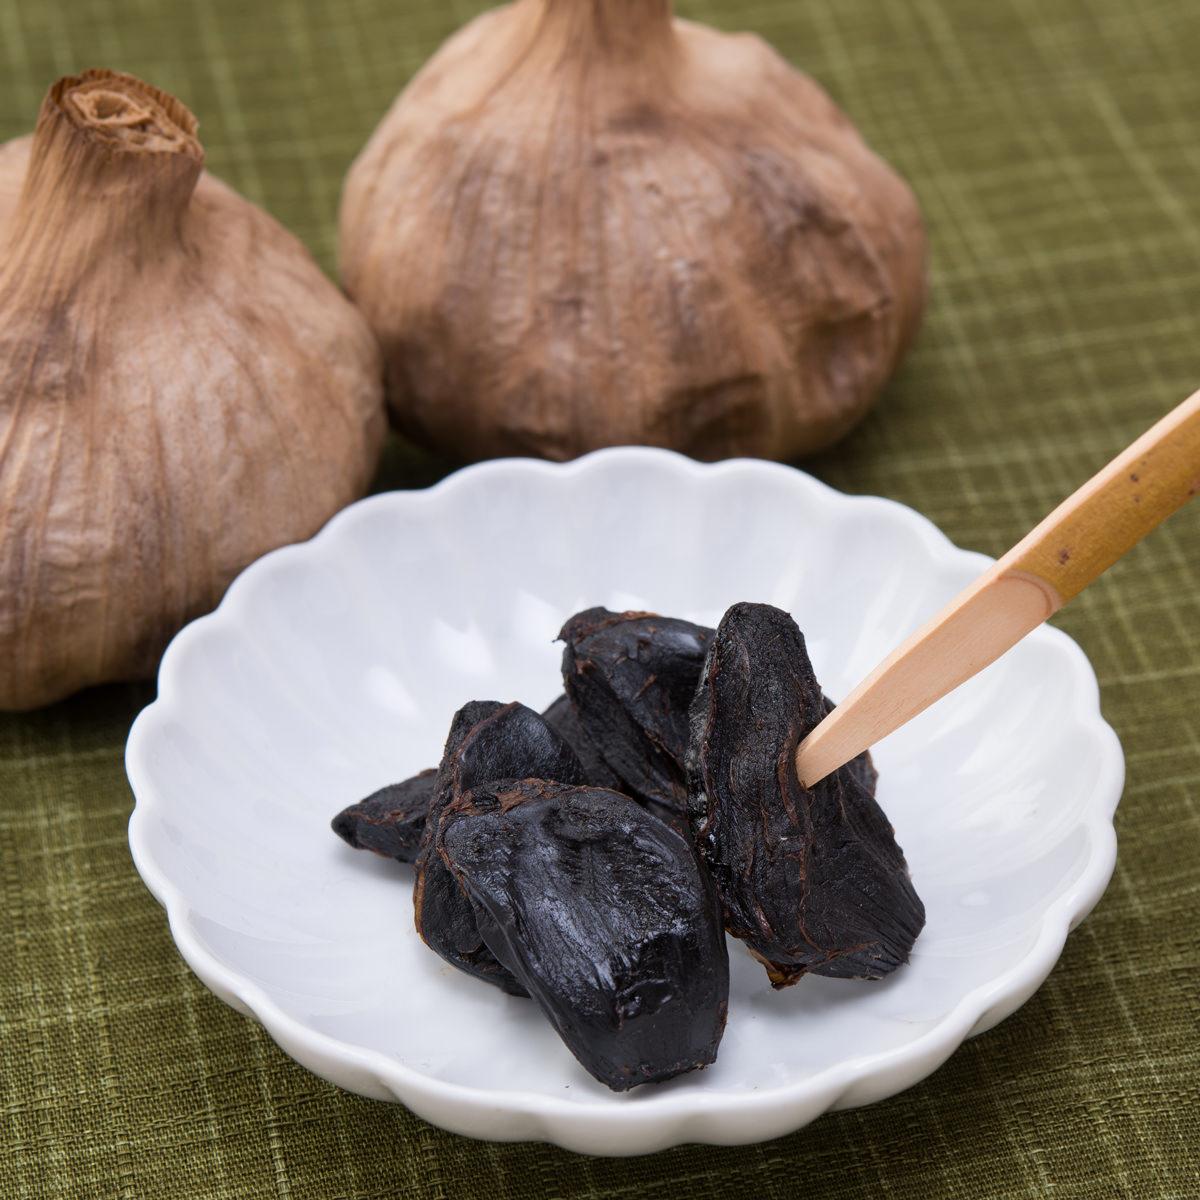 I JAPAN 山梨県の自社農園で熟成したフルーティーな味と食感 甲斐の黒にんにく〔300g〕